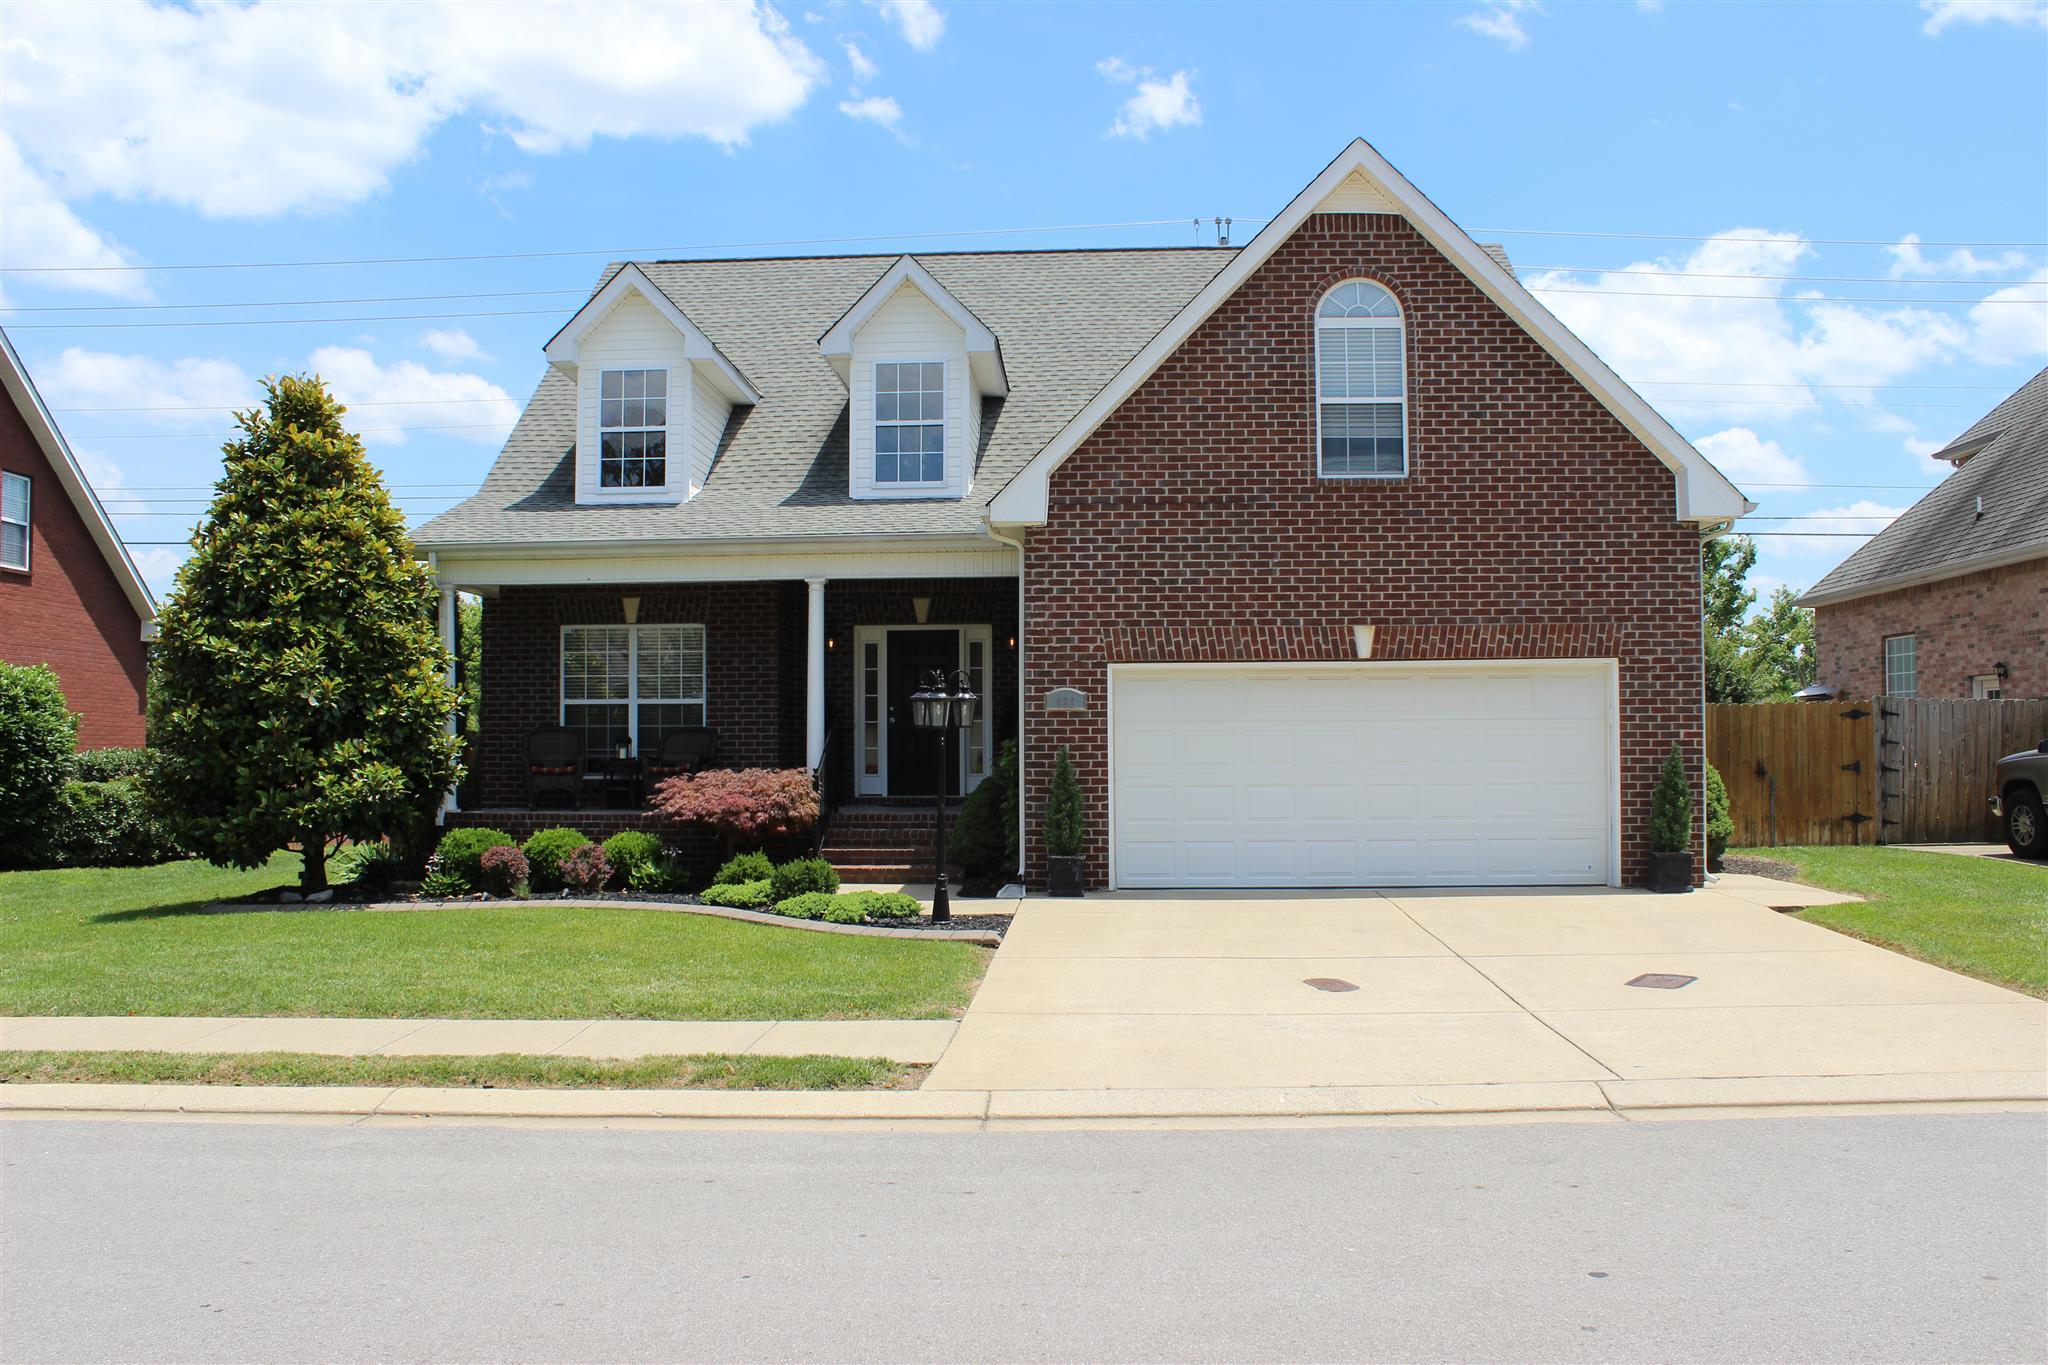 432 Bethany Cir, Murfreesboro, TN 37128